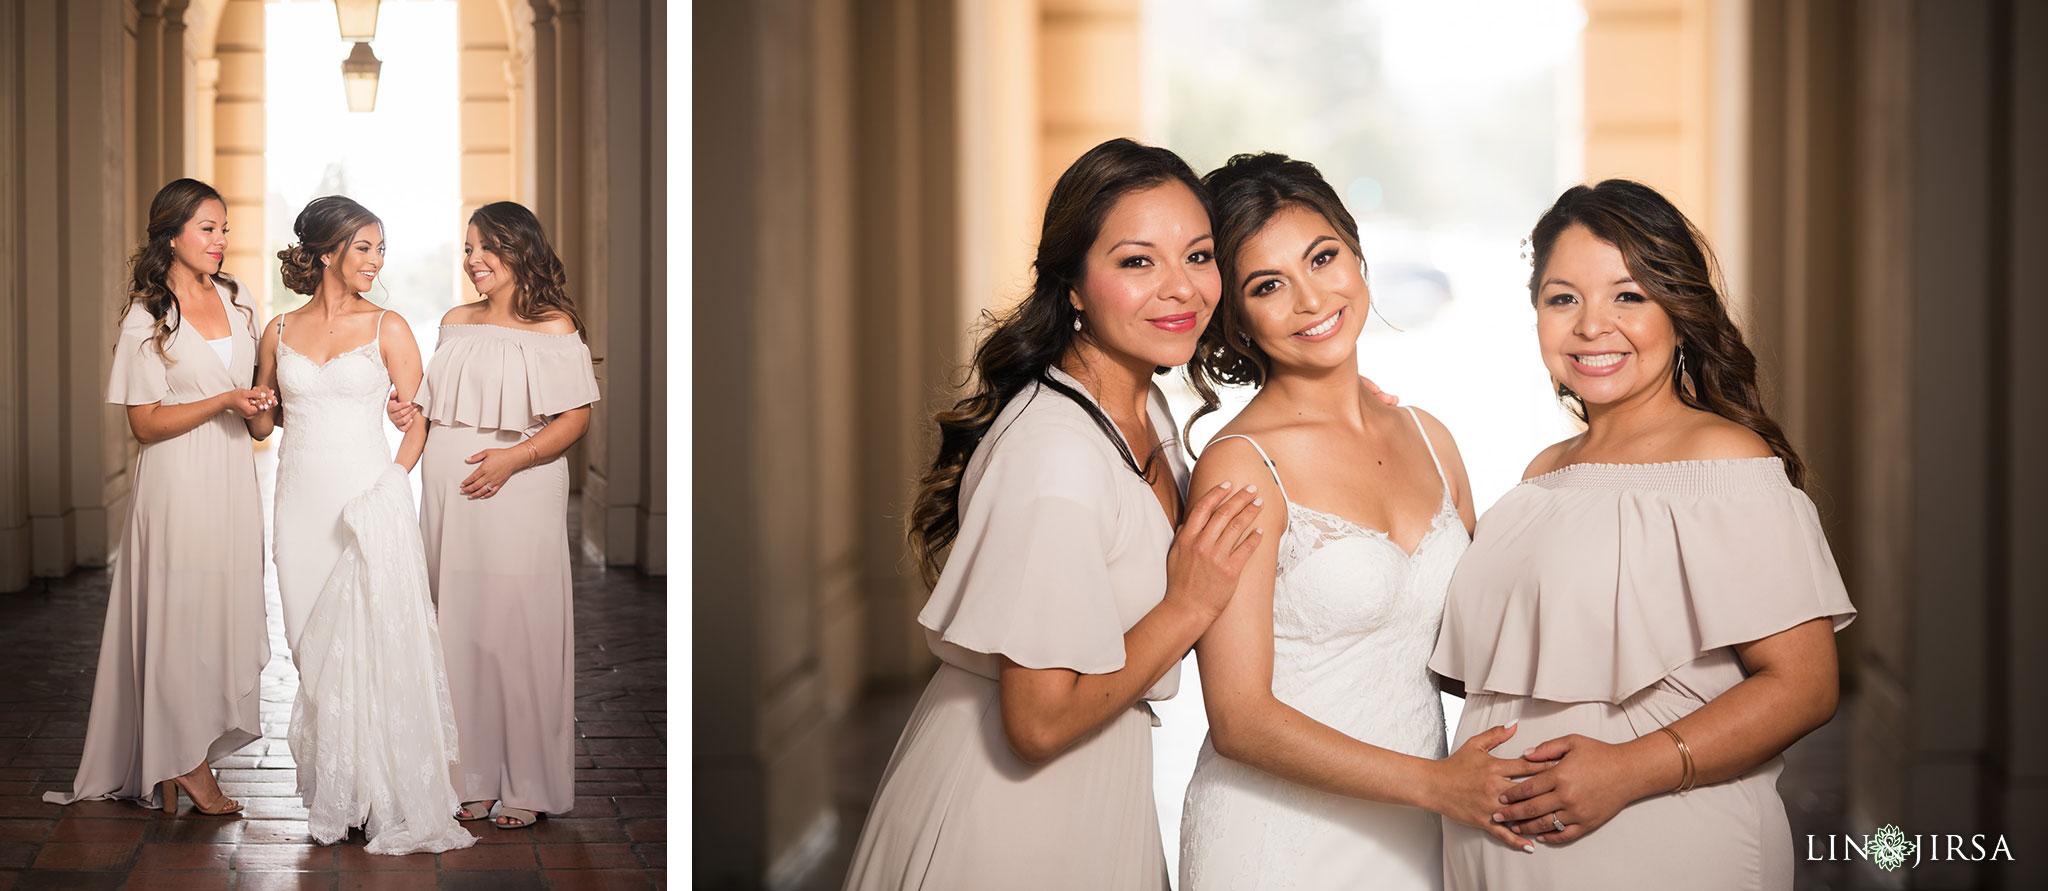 008 york manor los angeles wedding photography